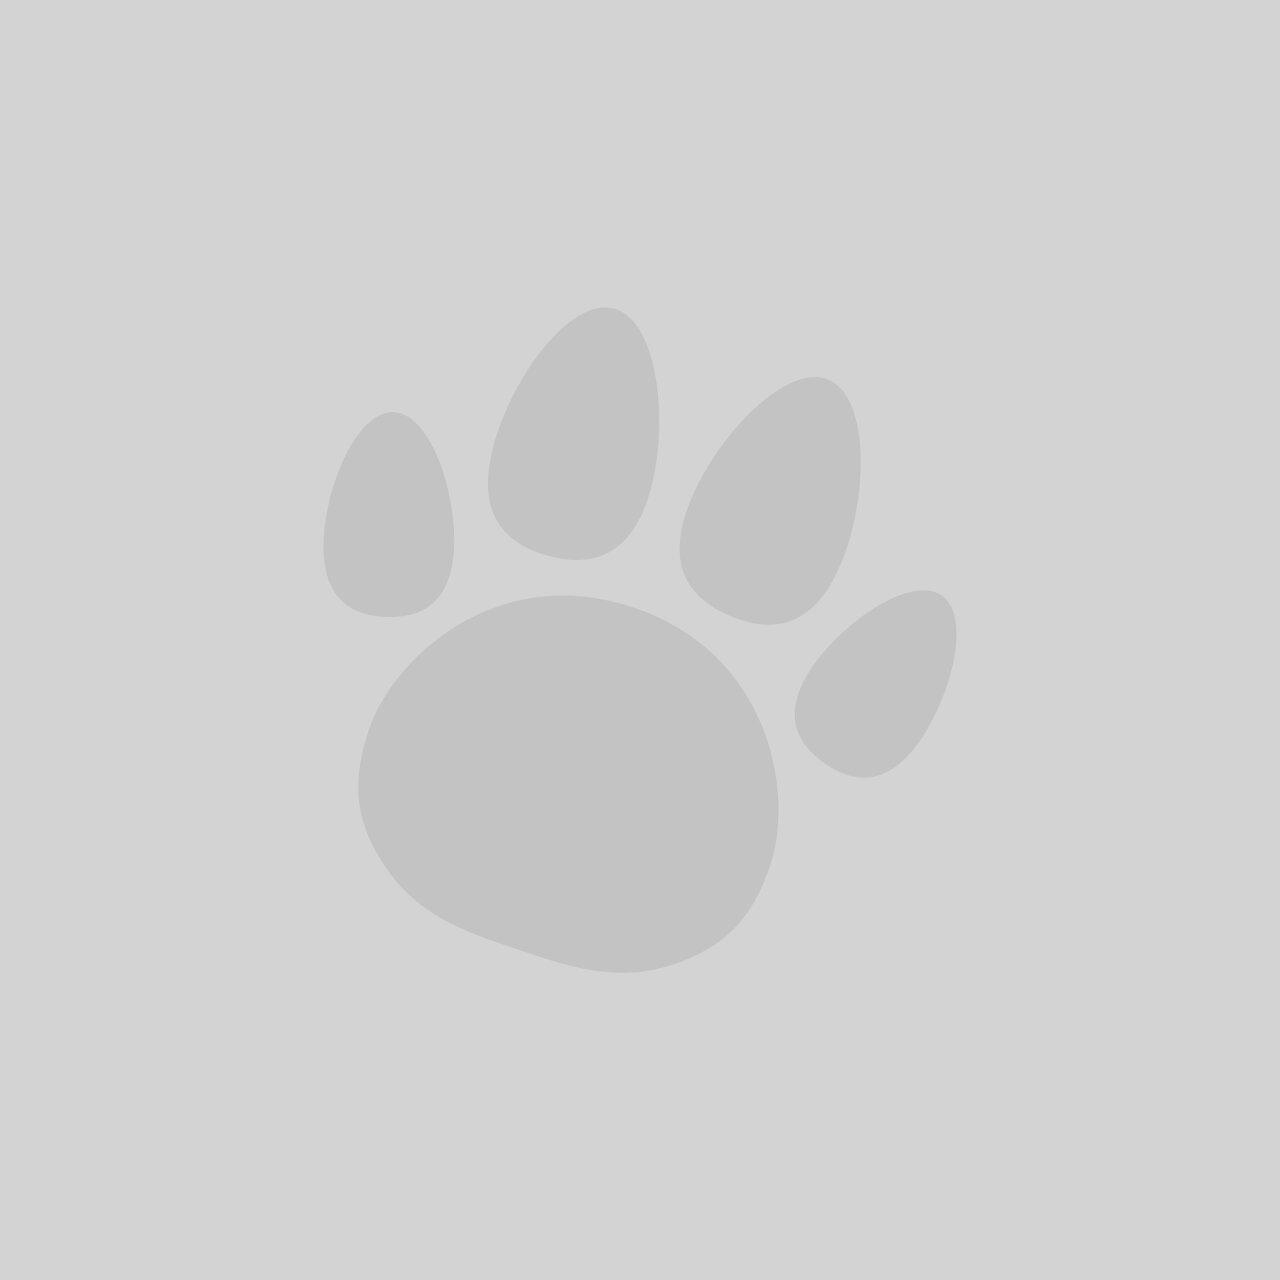 Hollings Puffed Jerky Dog Chews 400g